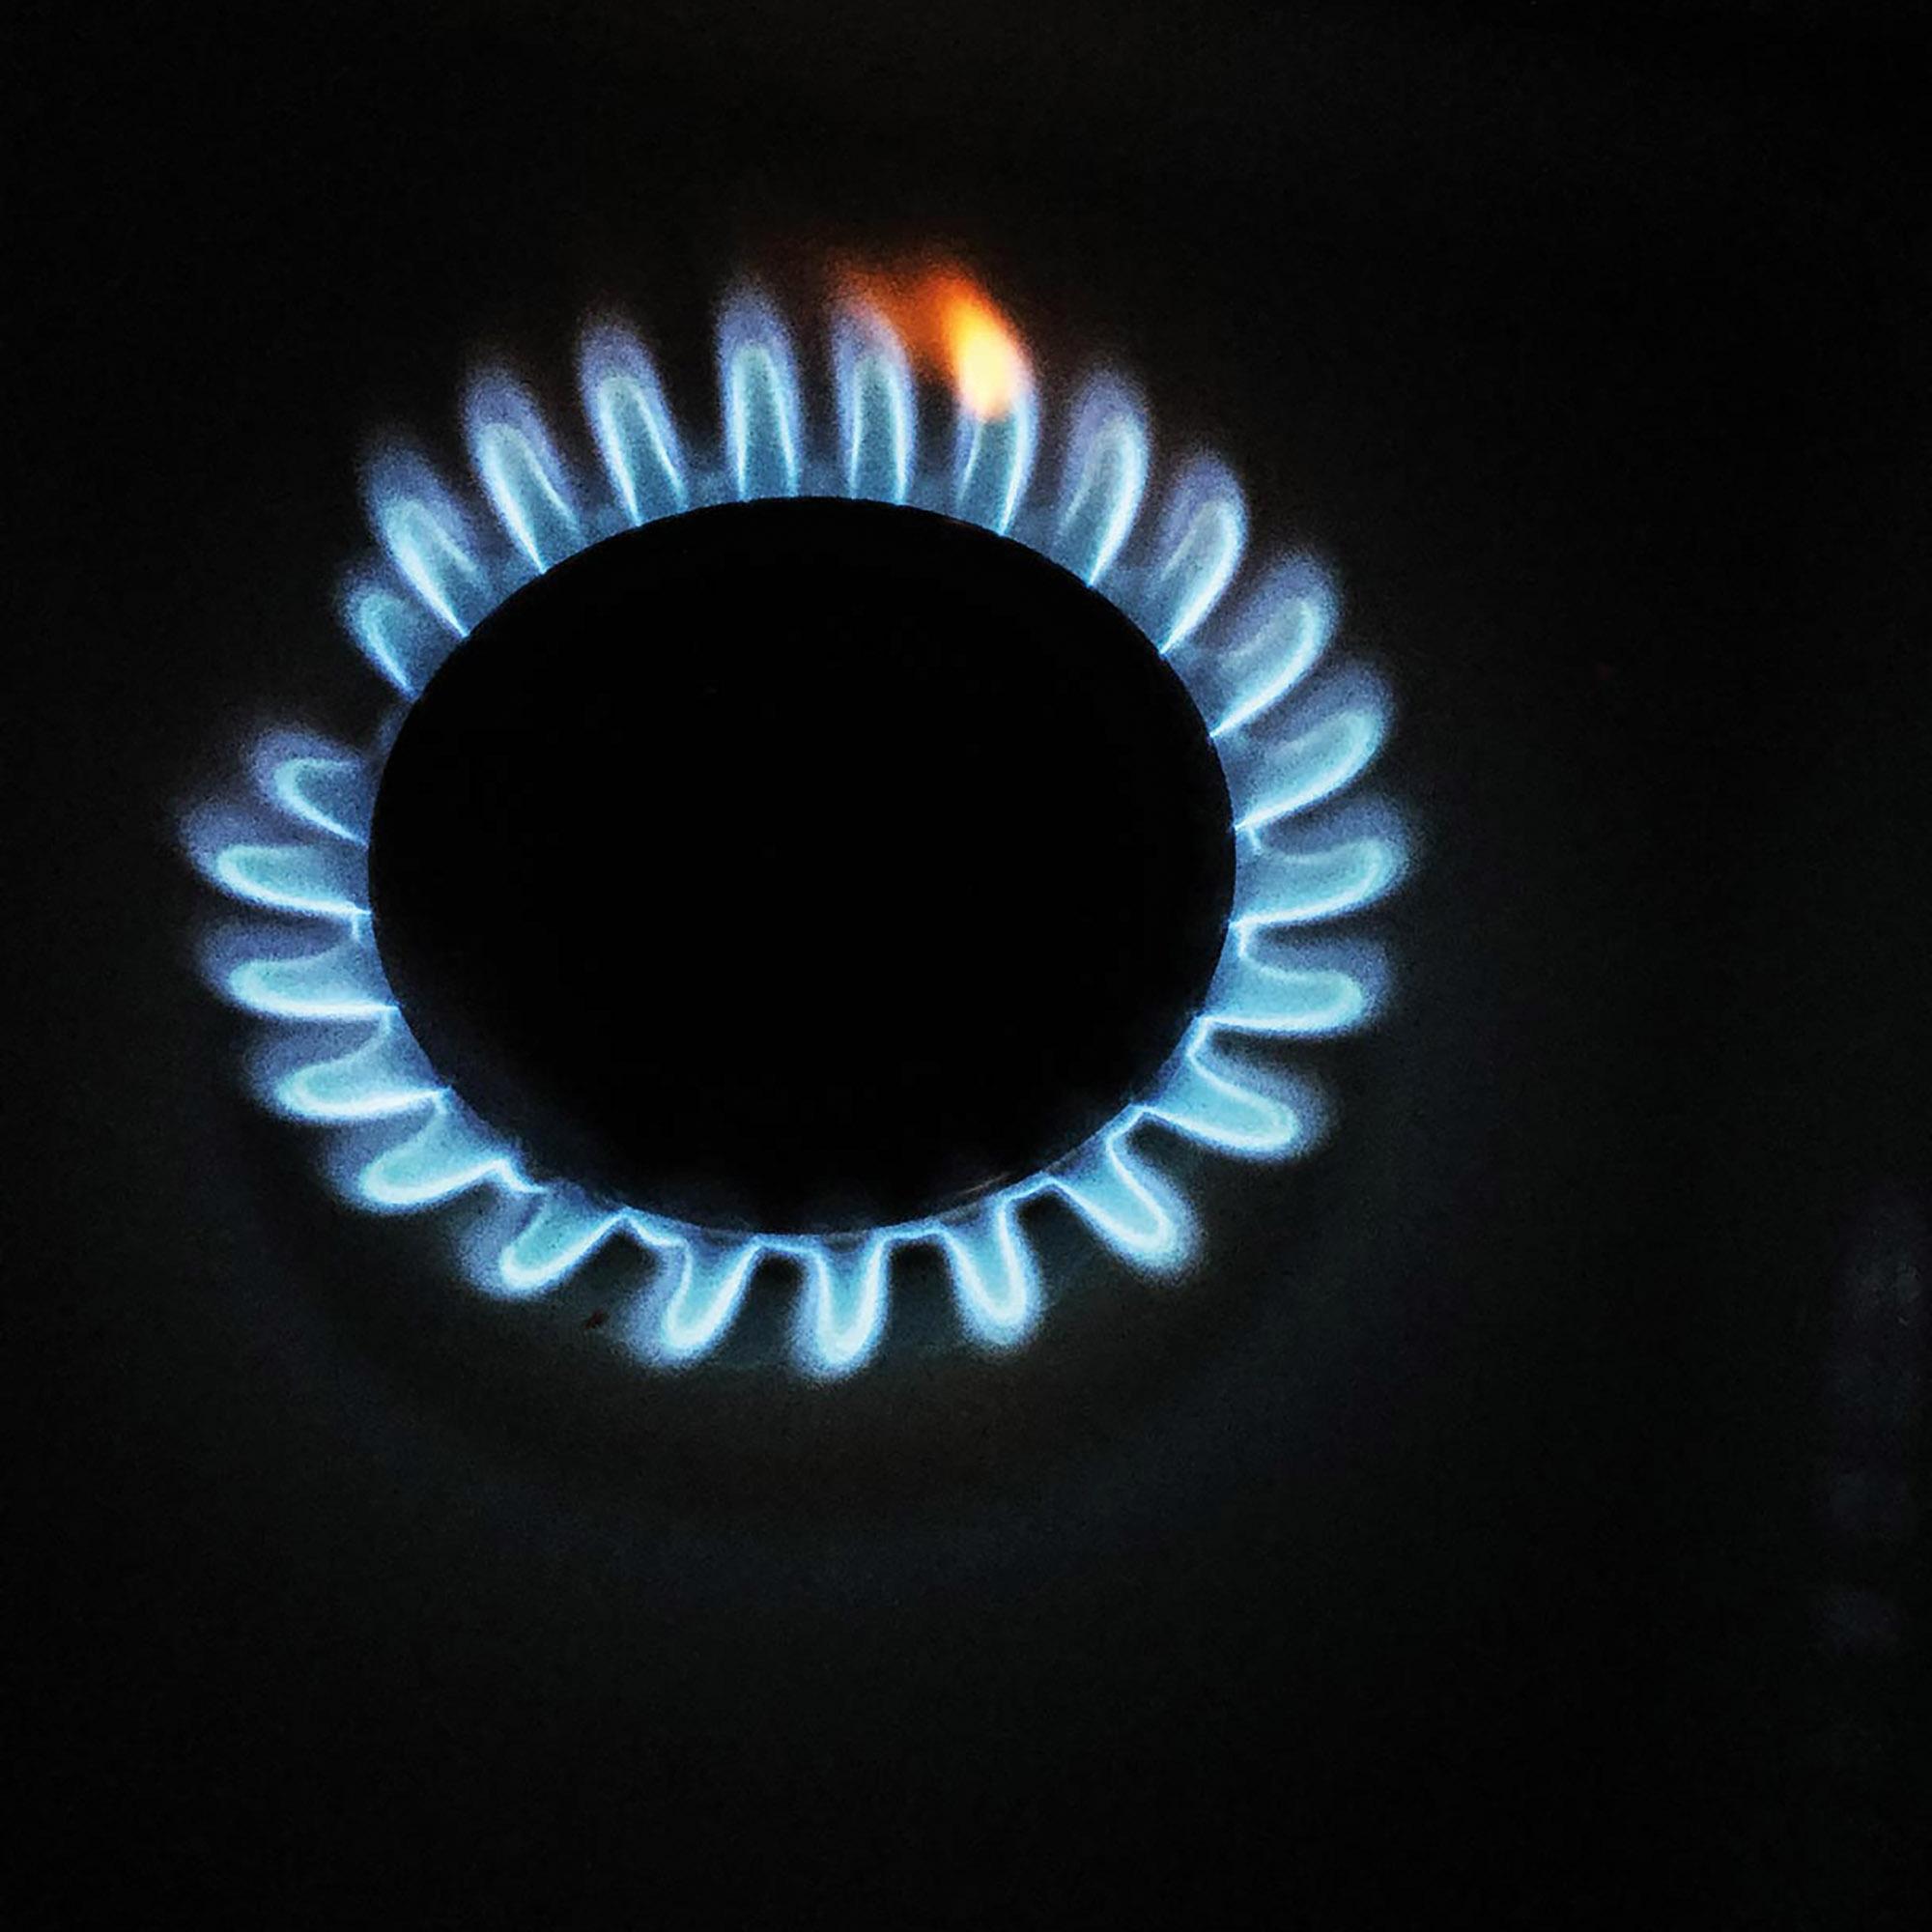 sp1_Gas-3000 x 3999-LR-Louis.jpg